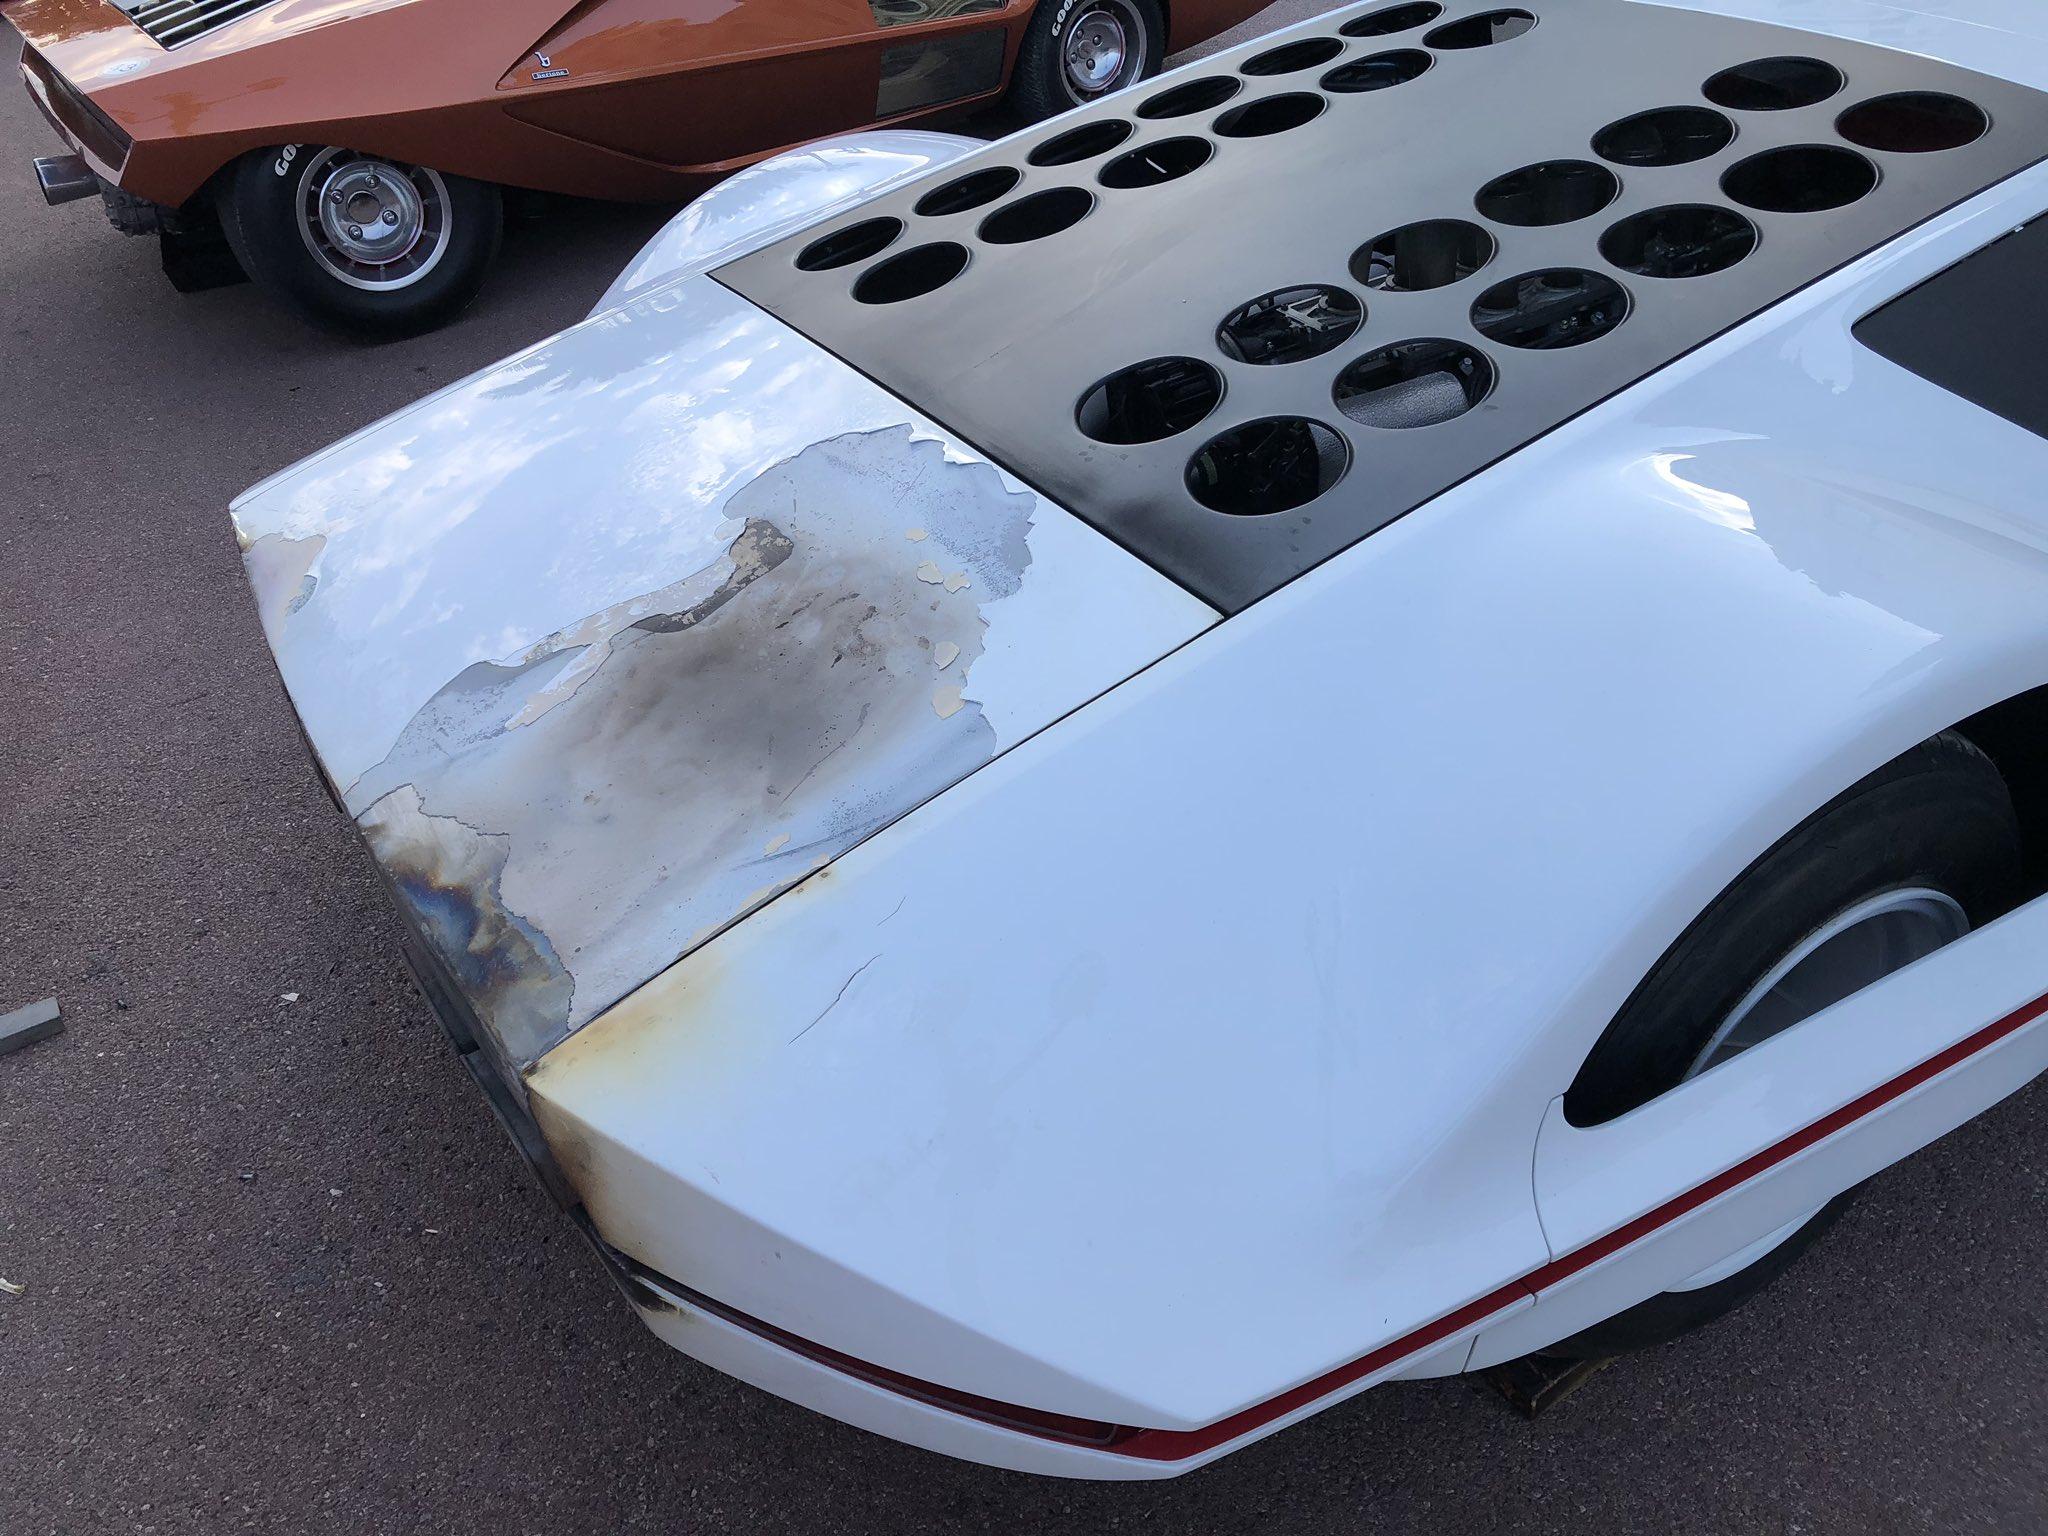 Ferrari Modulo fire damage